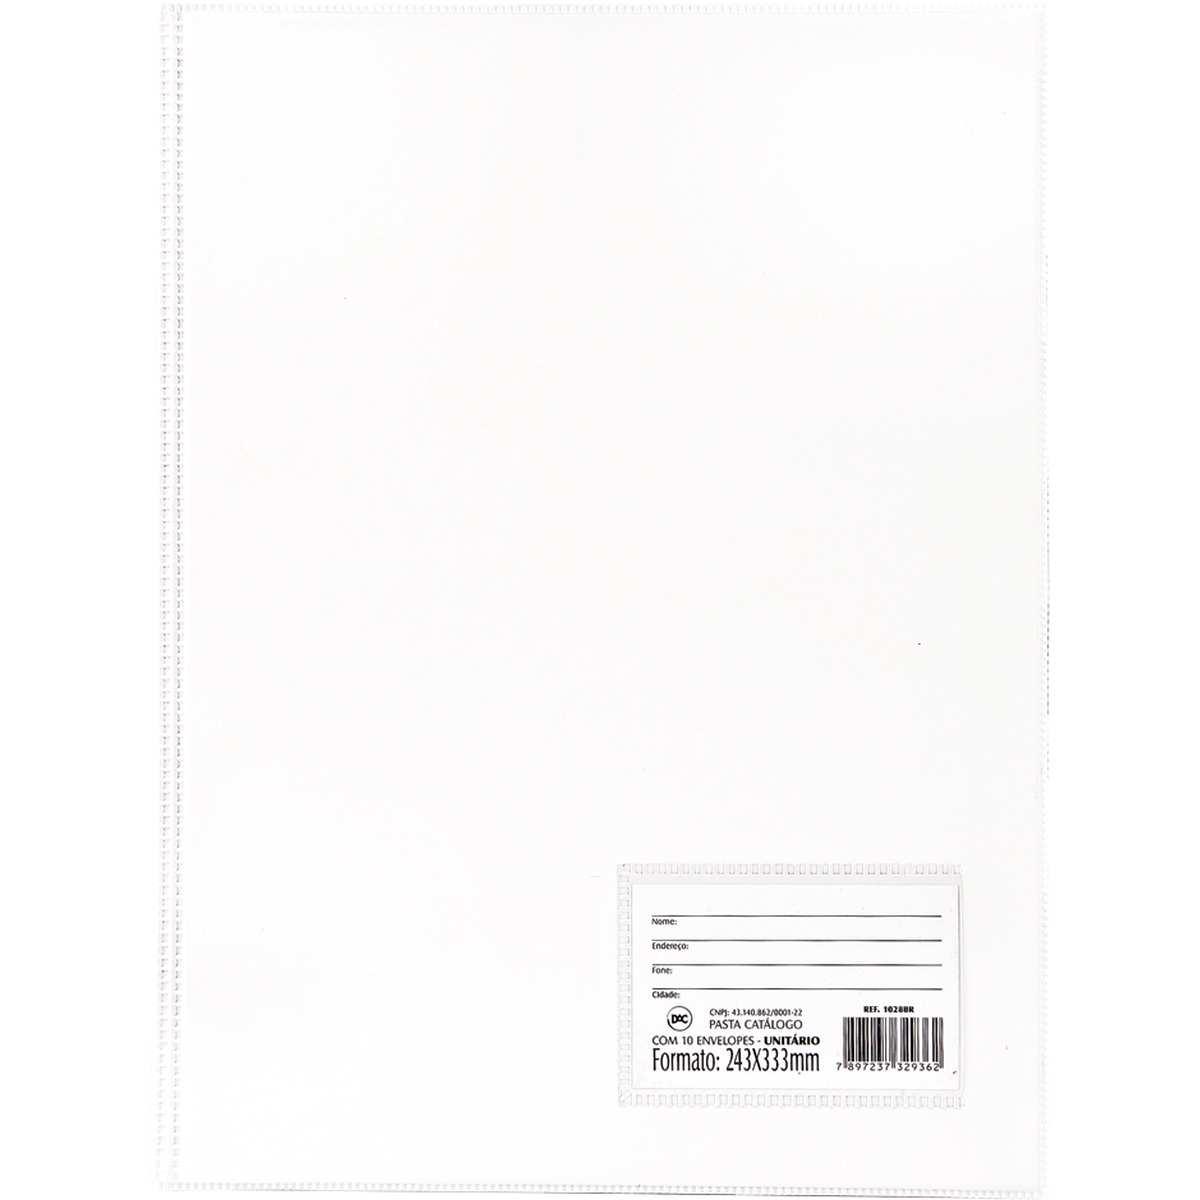 Pasta Catalogo - Oficio c/50 Envelopes Finos Branca - Dac